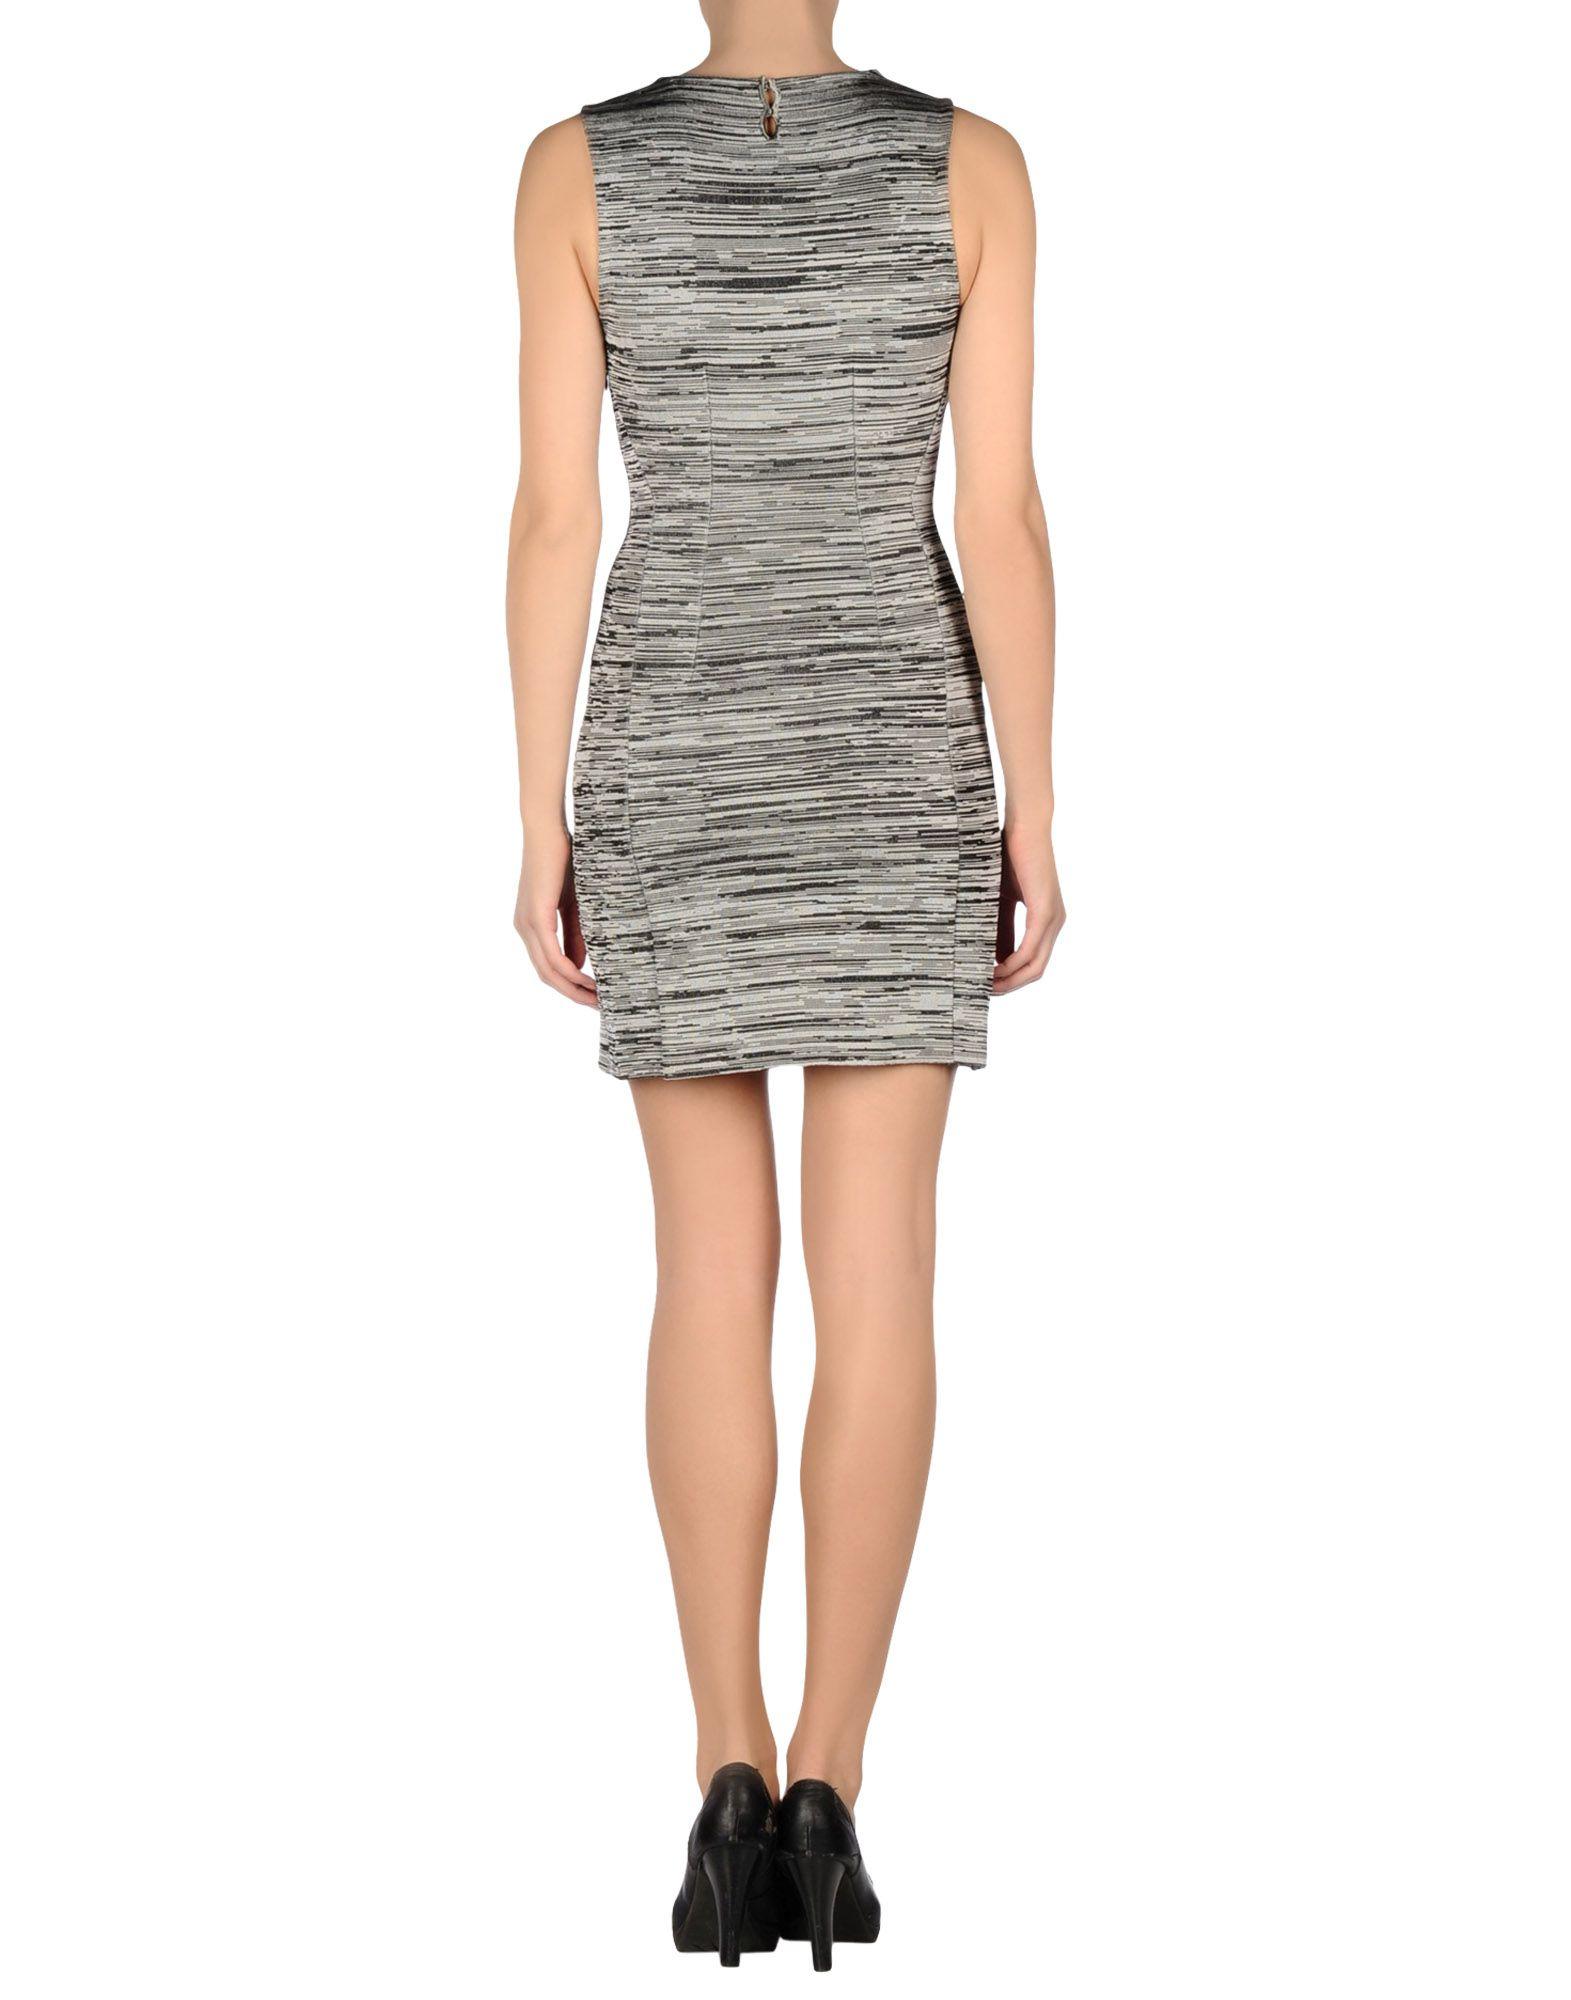 dior short dresses - photo #15